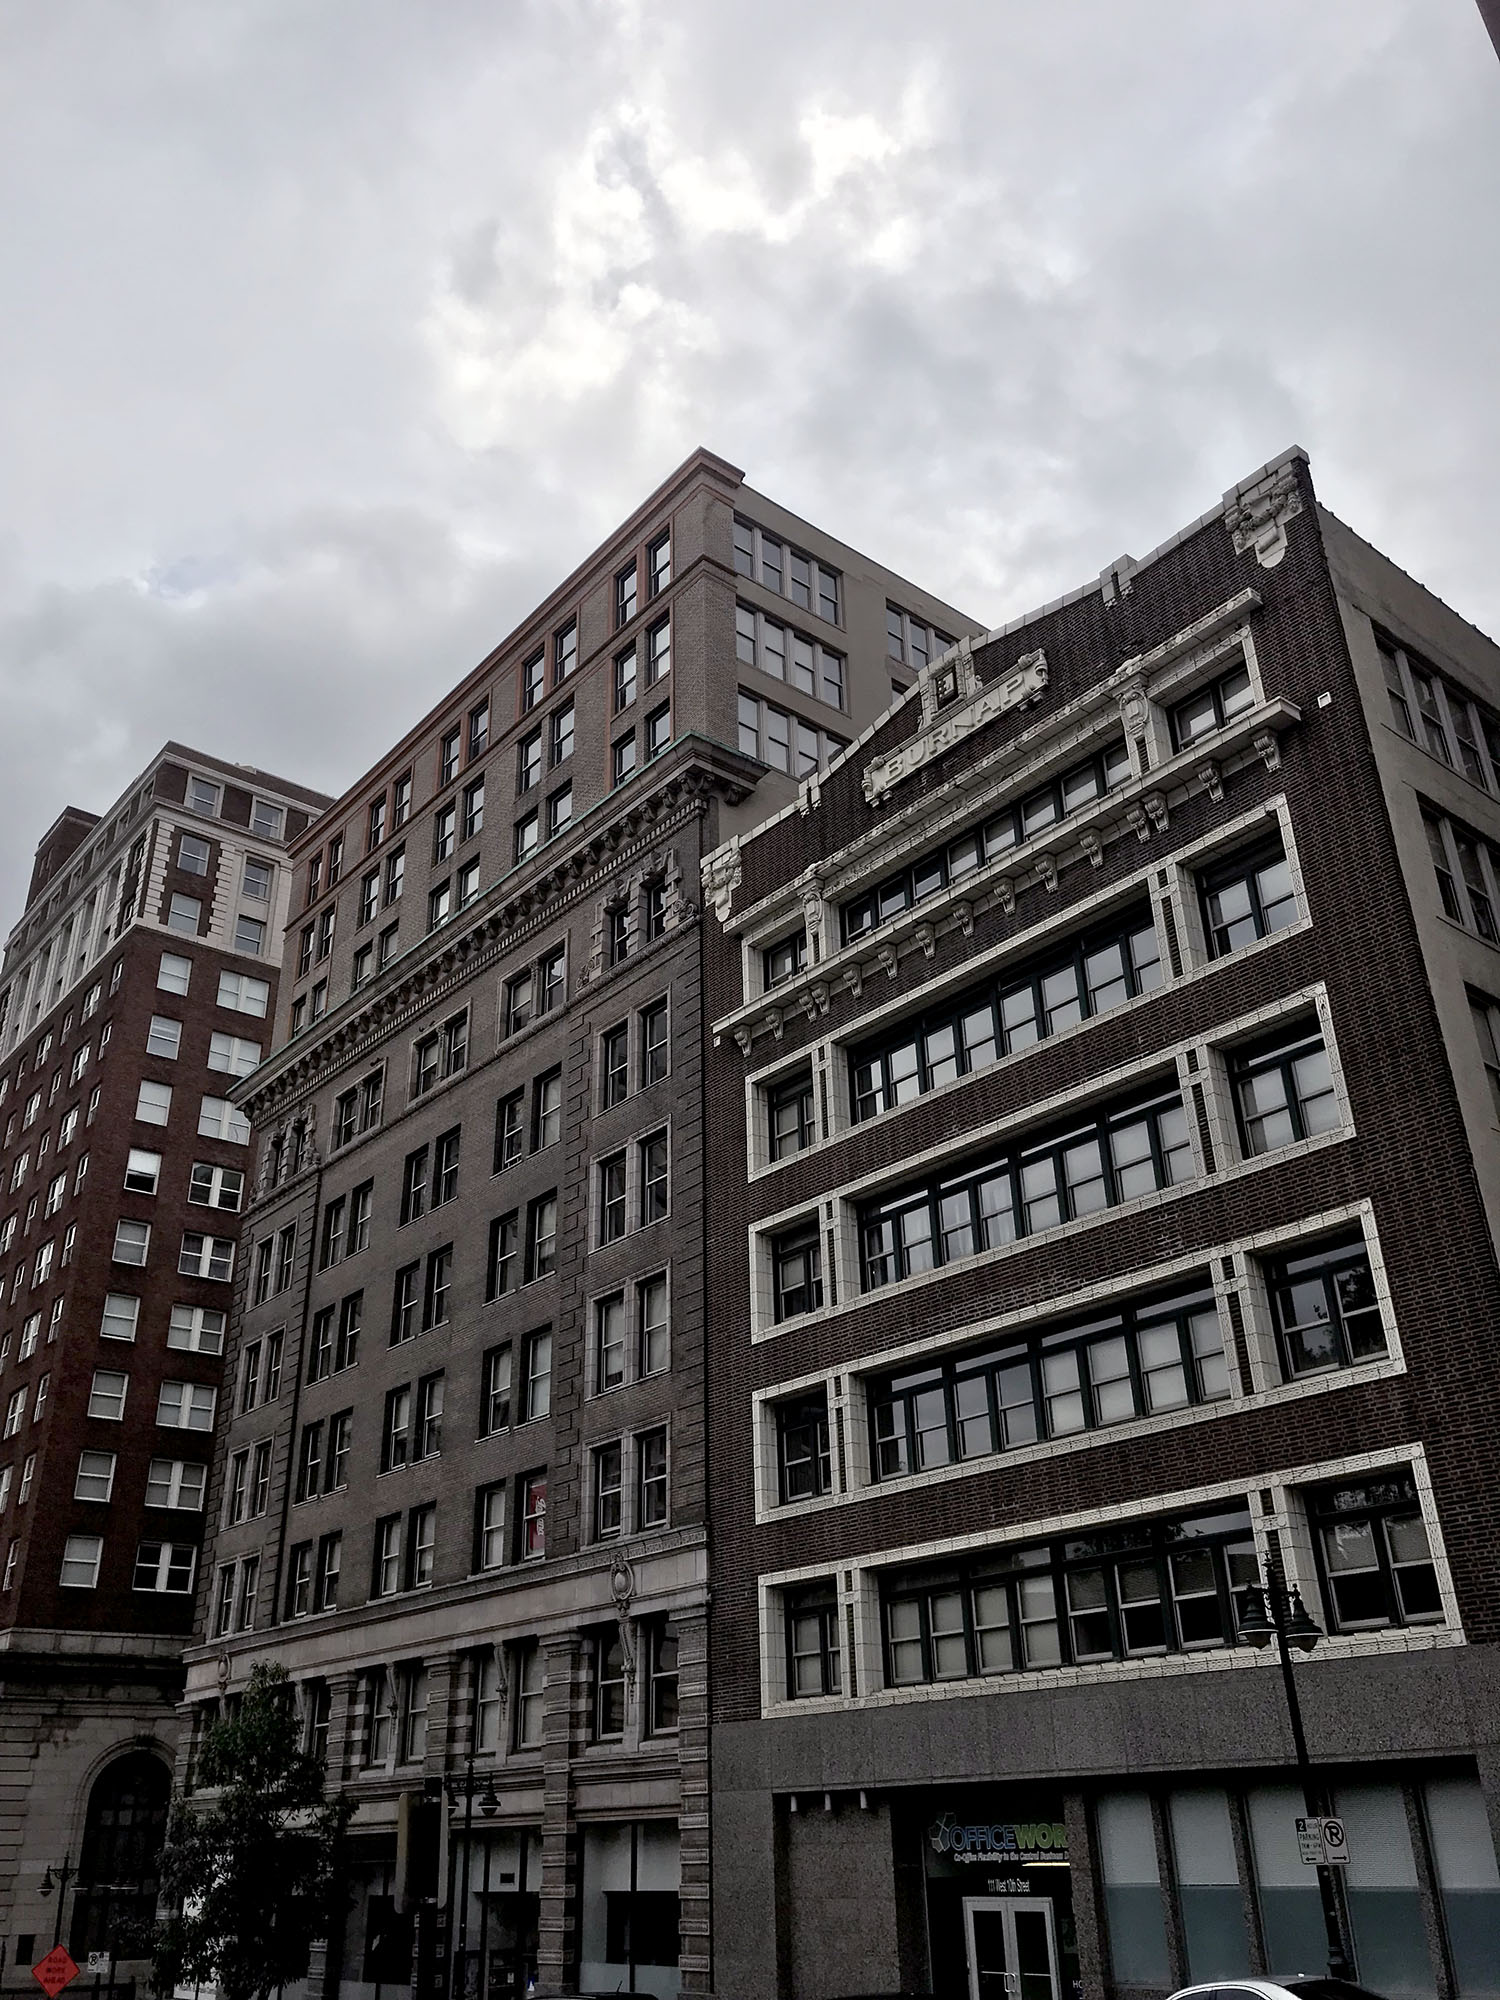 Generic Van Life - Welcome to Corn Tornado Country - Kansas City Buildings